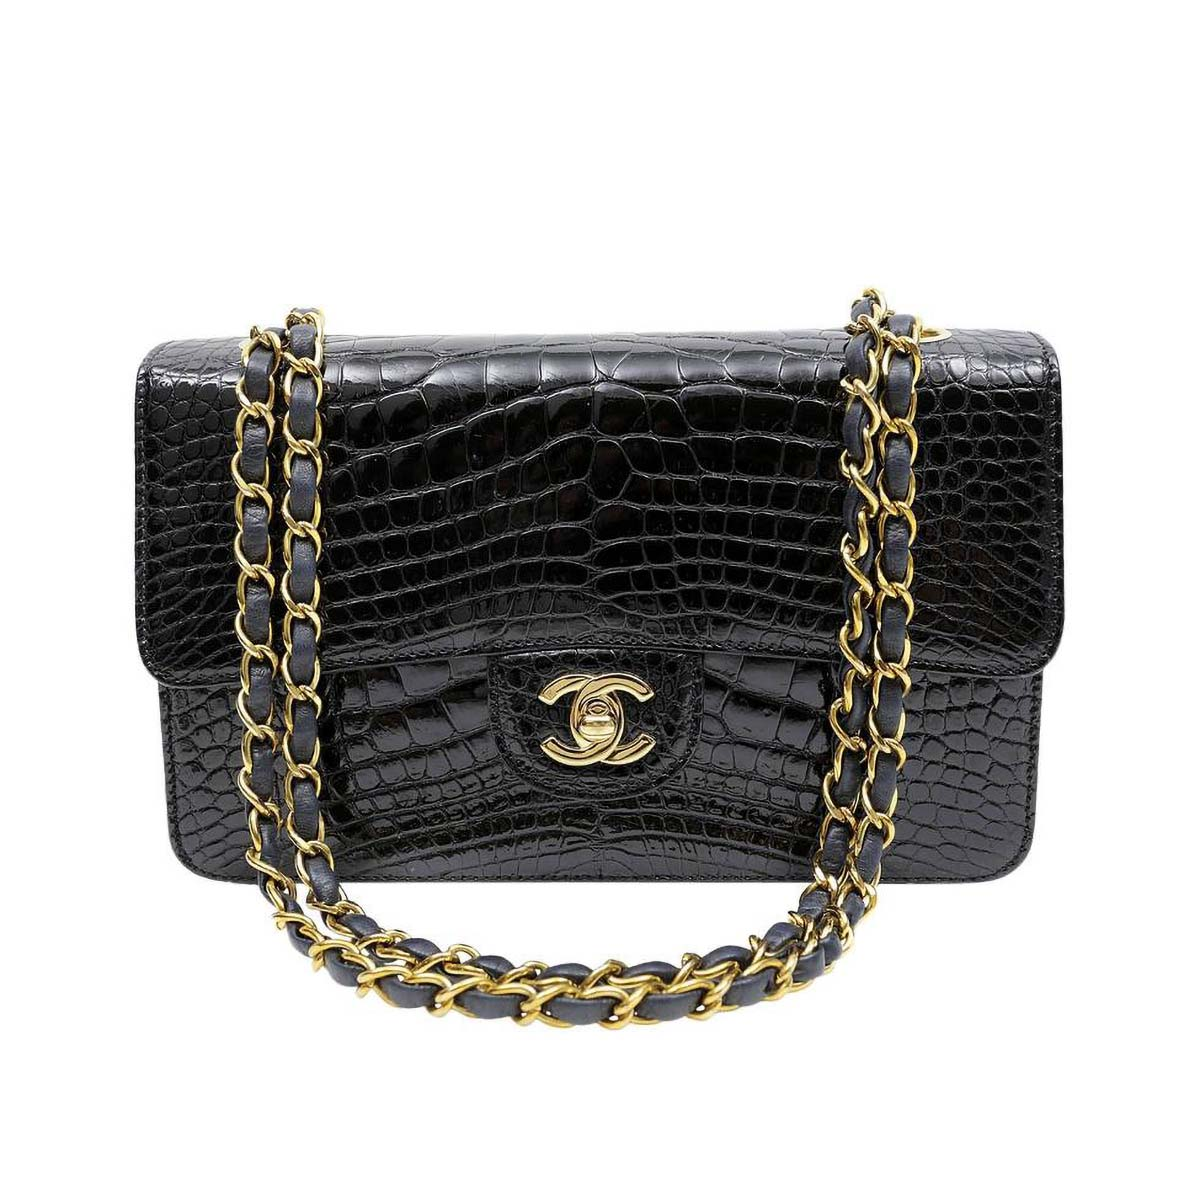 Chanel Medium Iconic Classic Single Flap Bag with Alligator Pattern